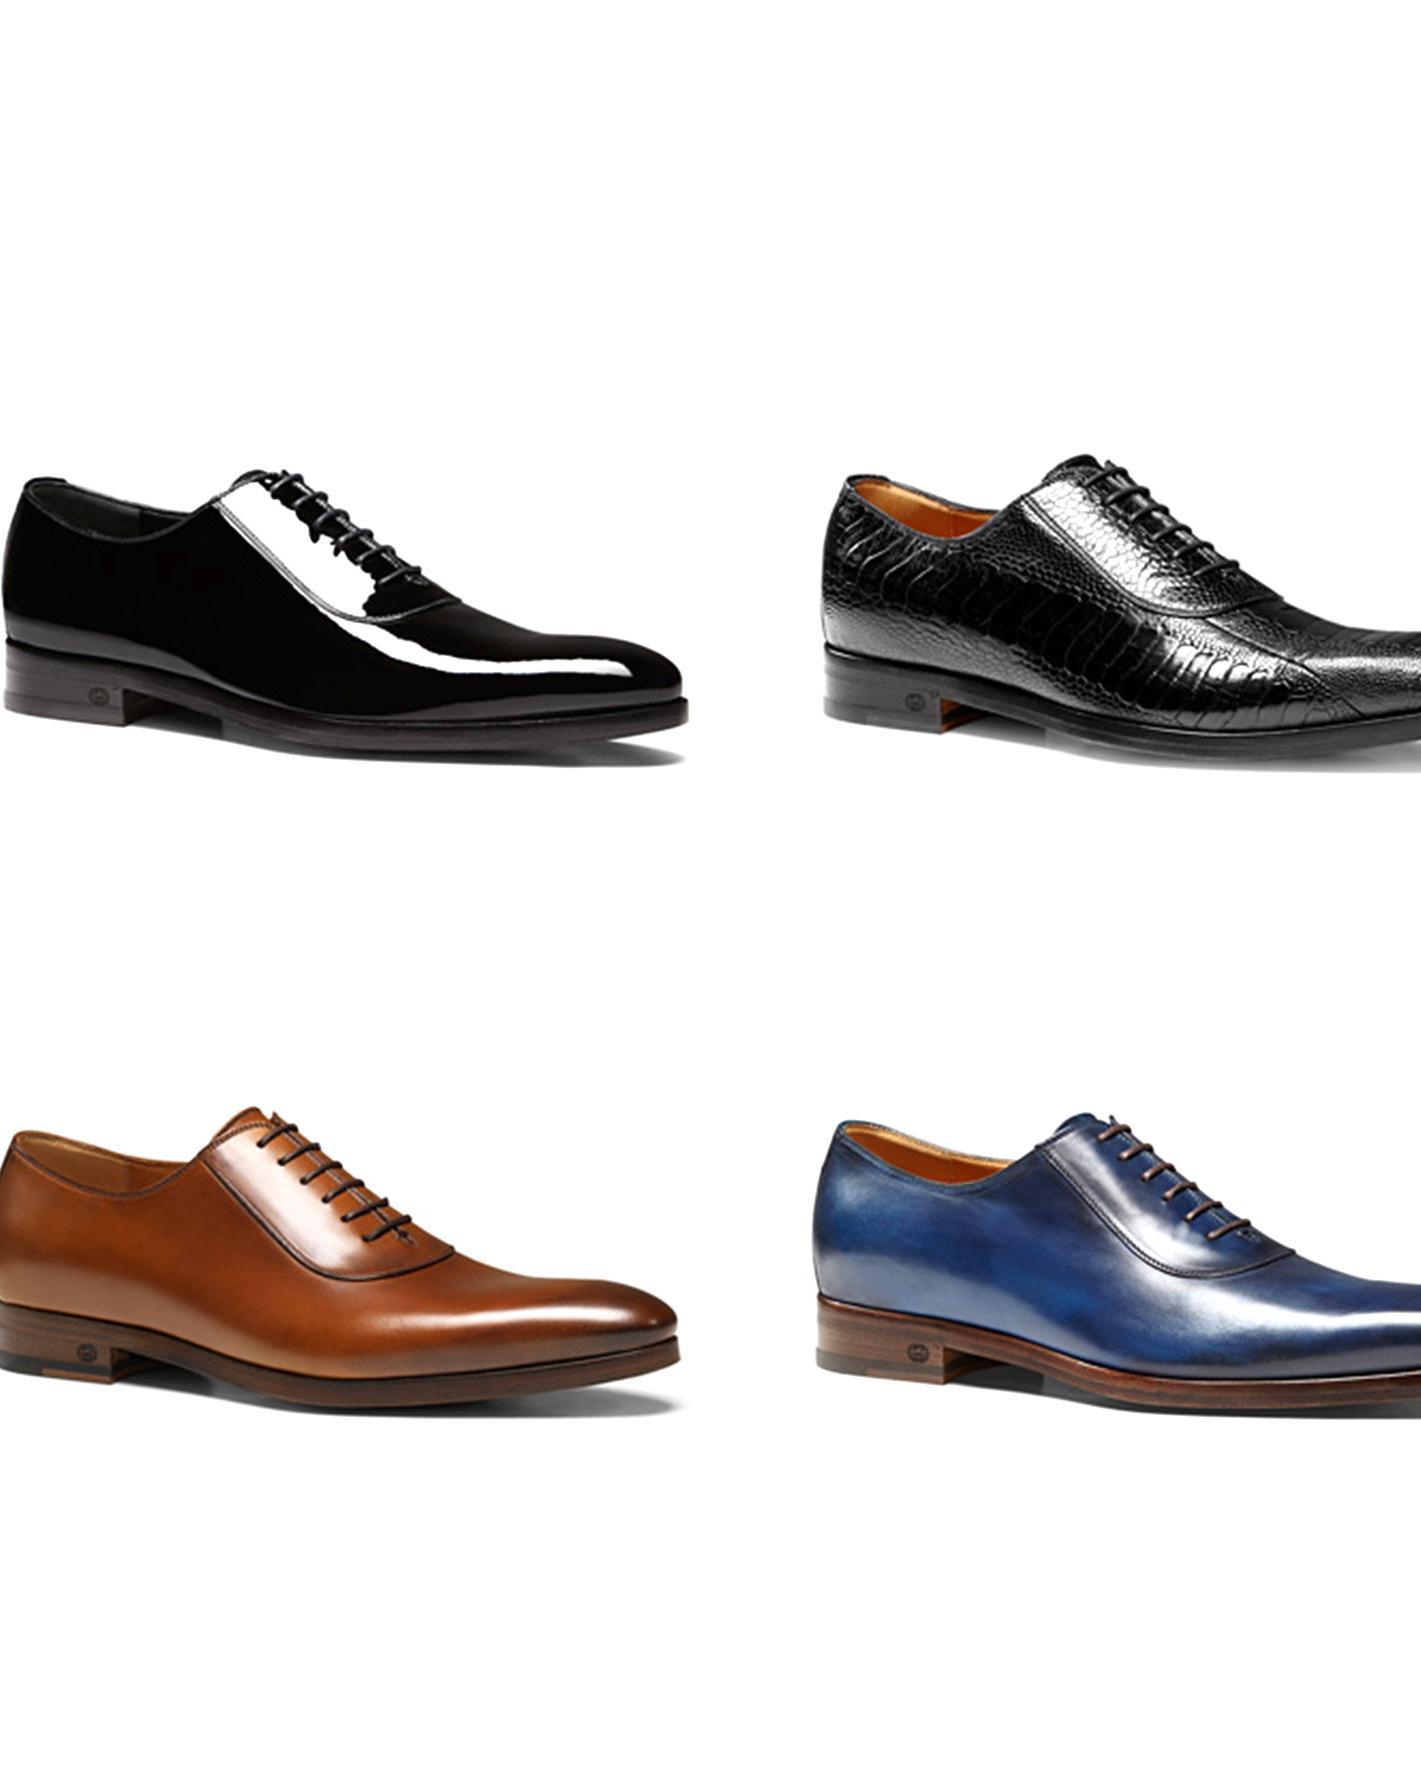 wedding-shoes-john-paul-tran-6-0815